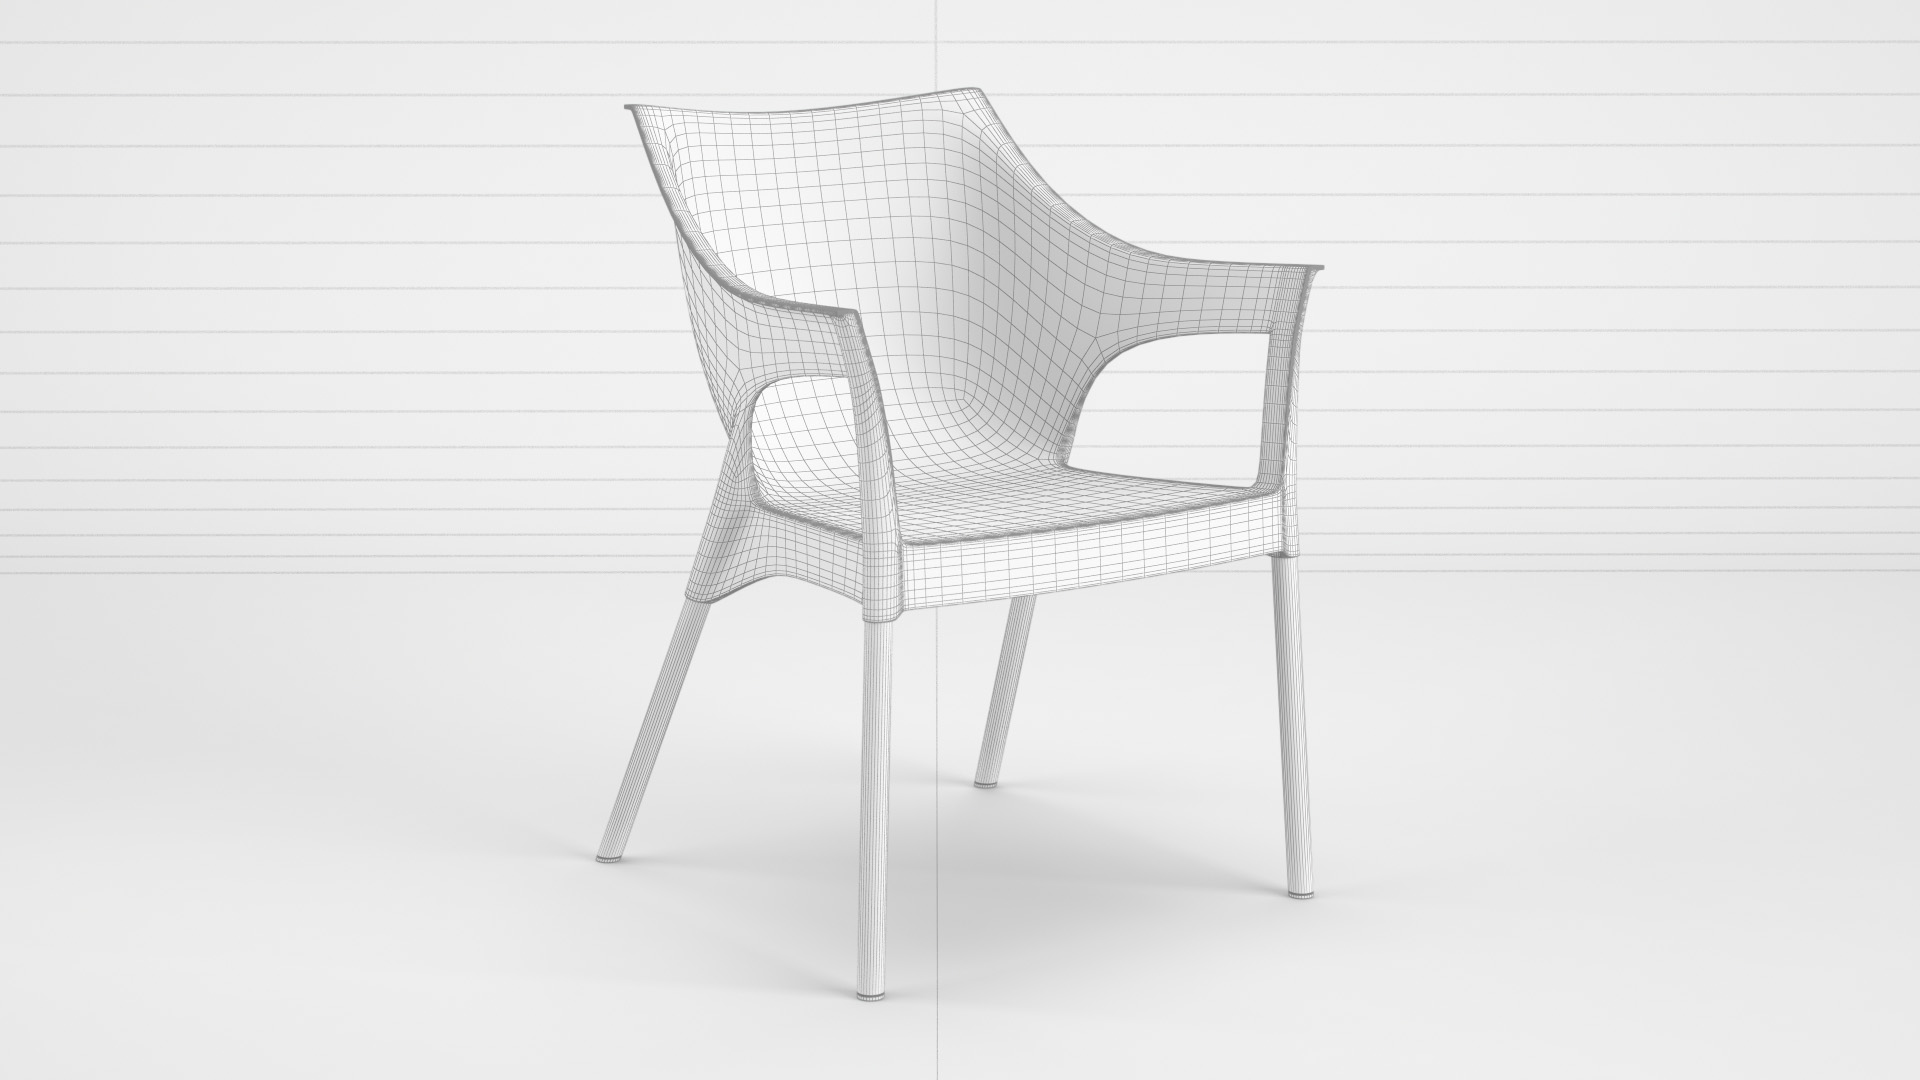 Pole_Chair_WhiteSet_01_wire_0000